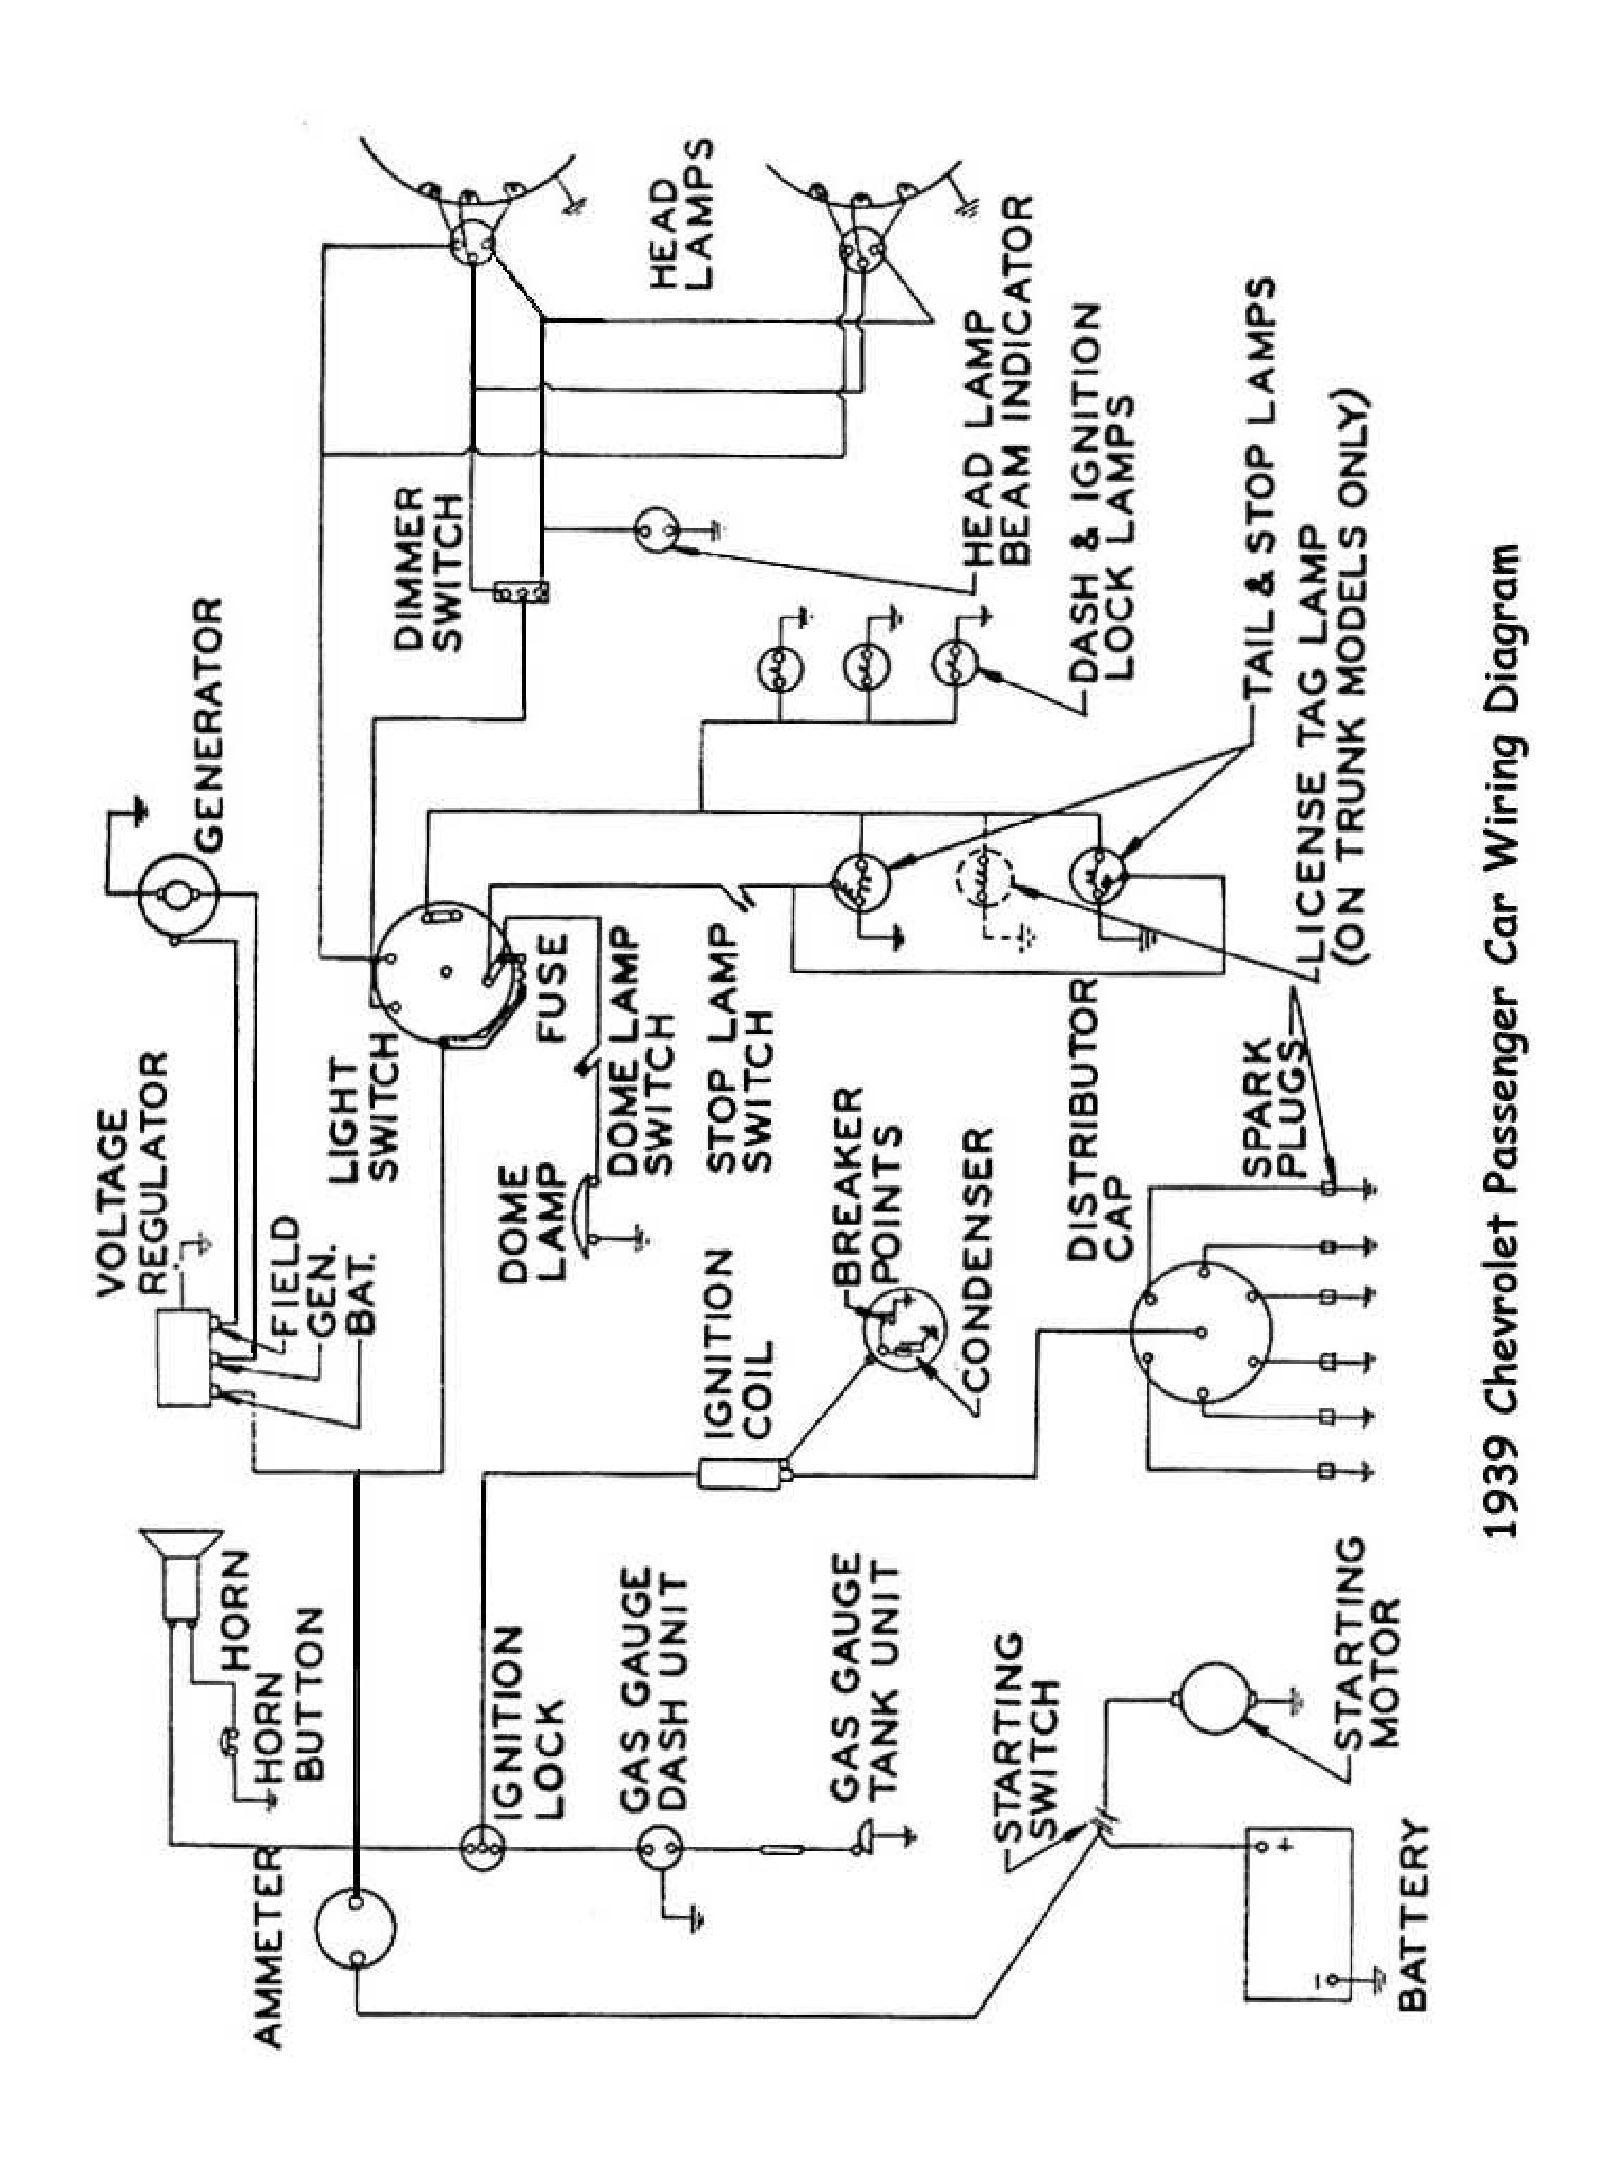 2011 dodge ram 1500 headlight wiring diagram